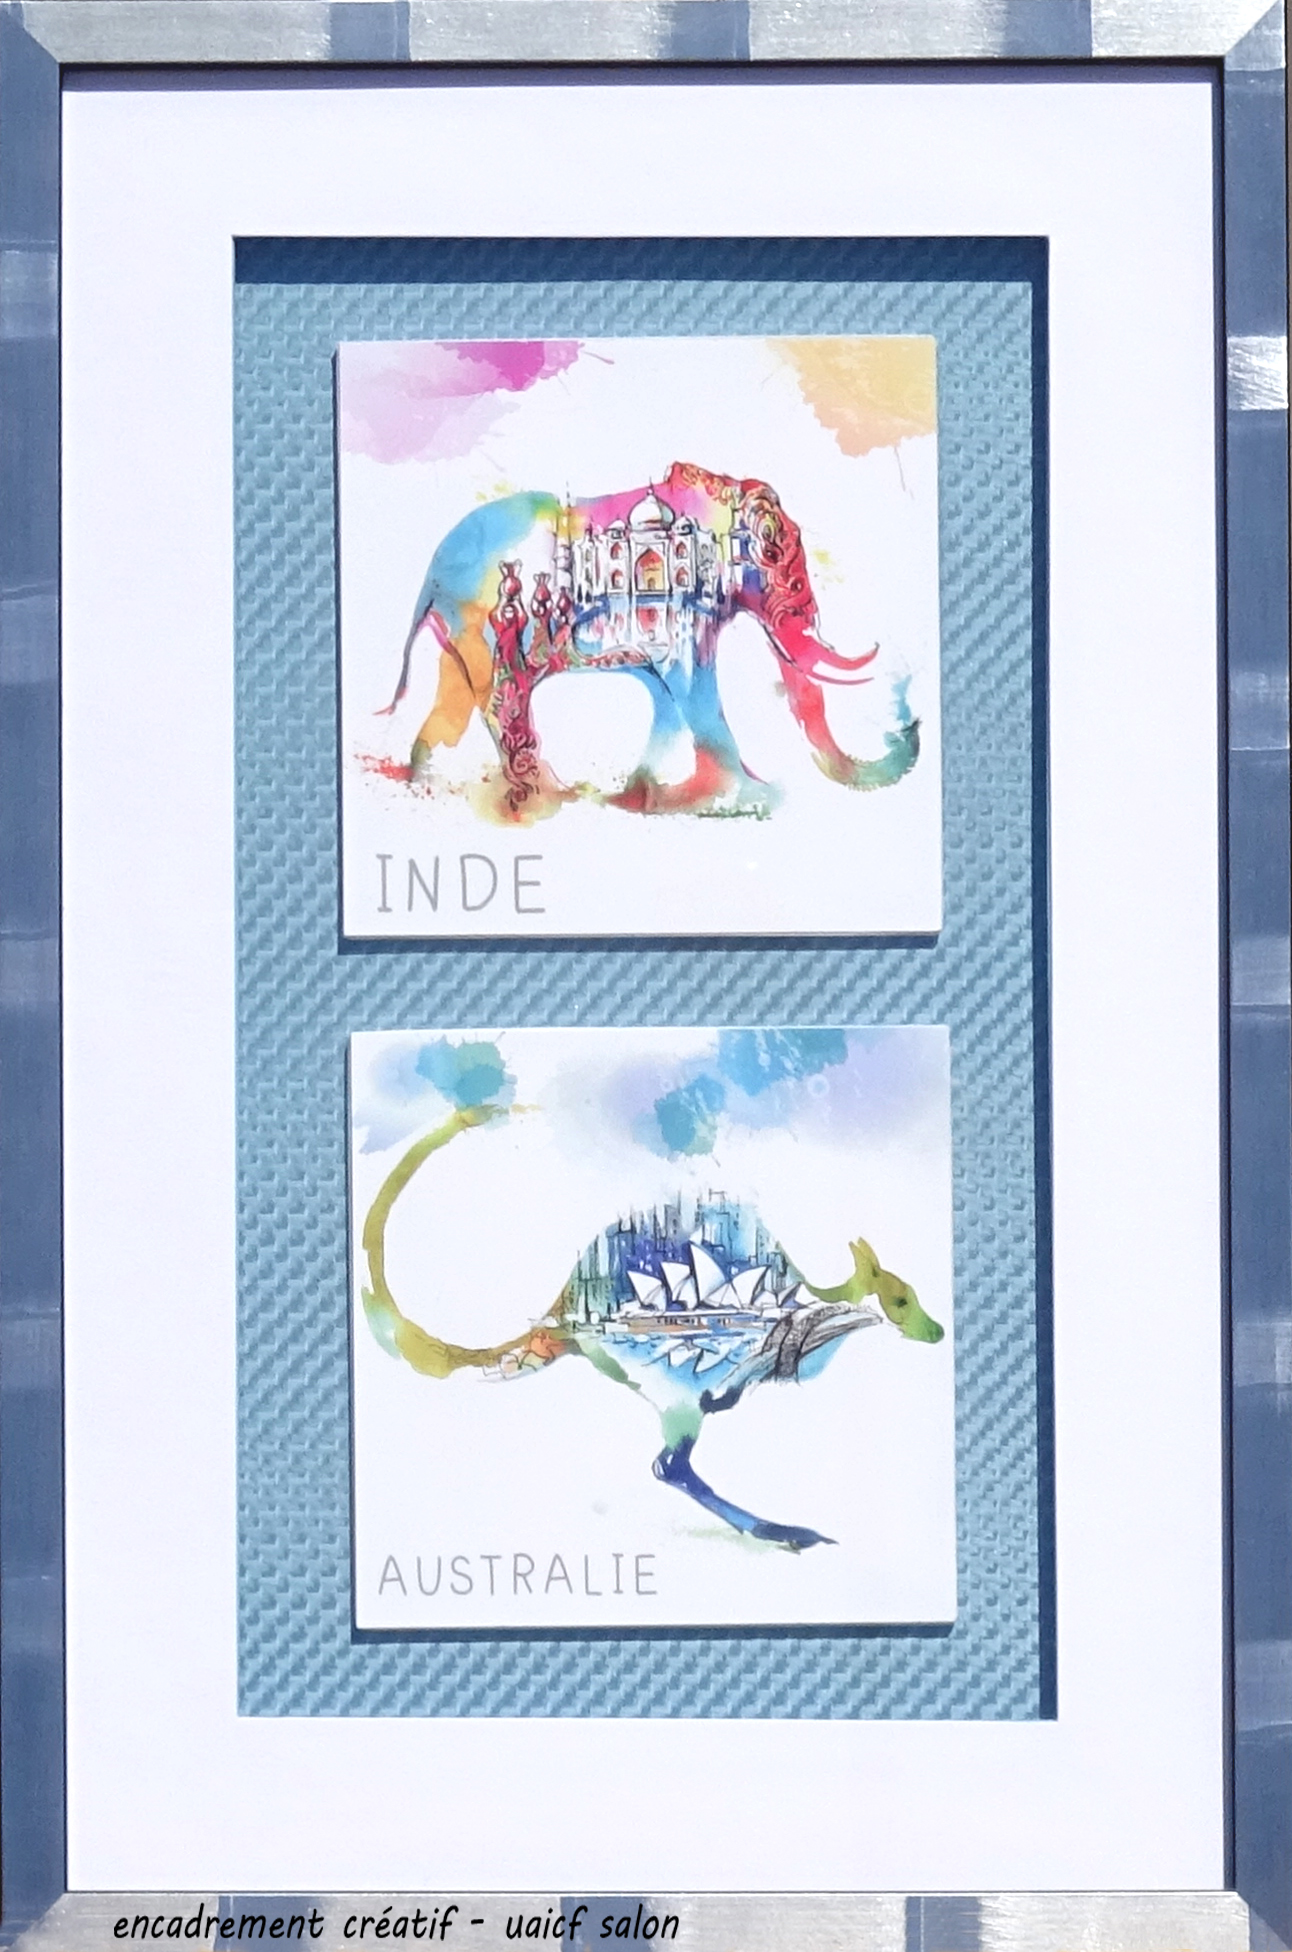 Inde Australie